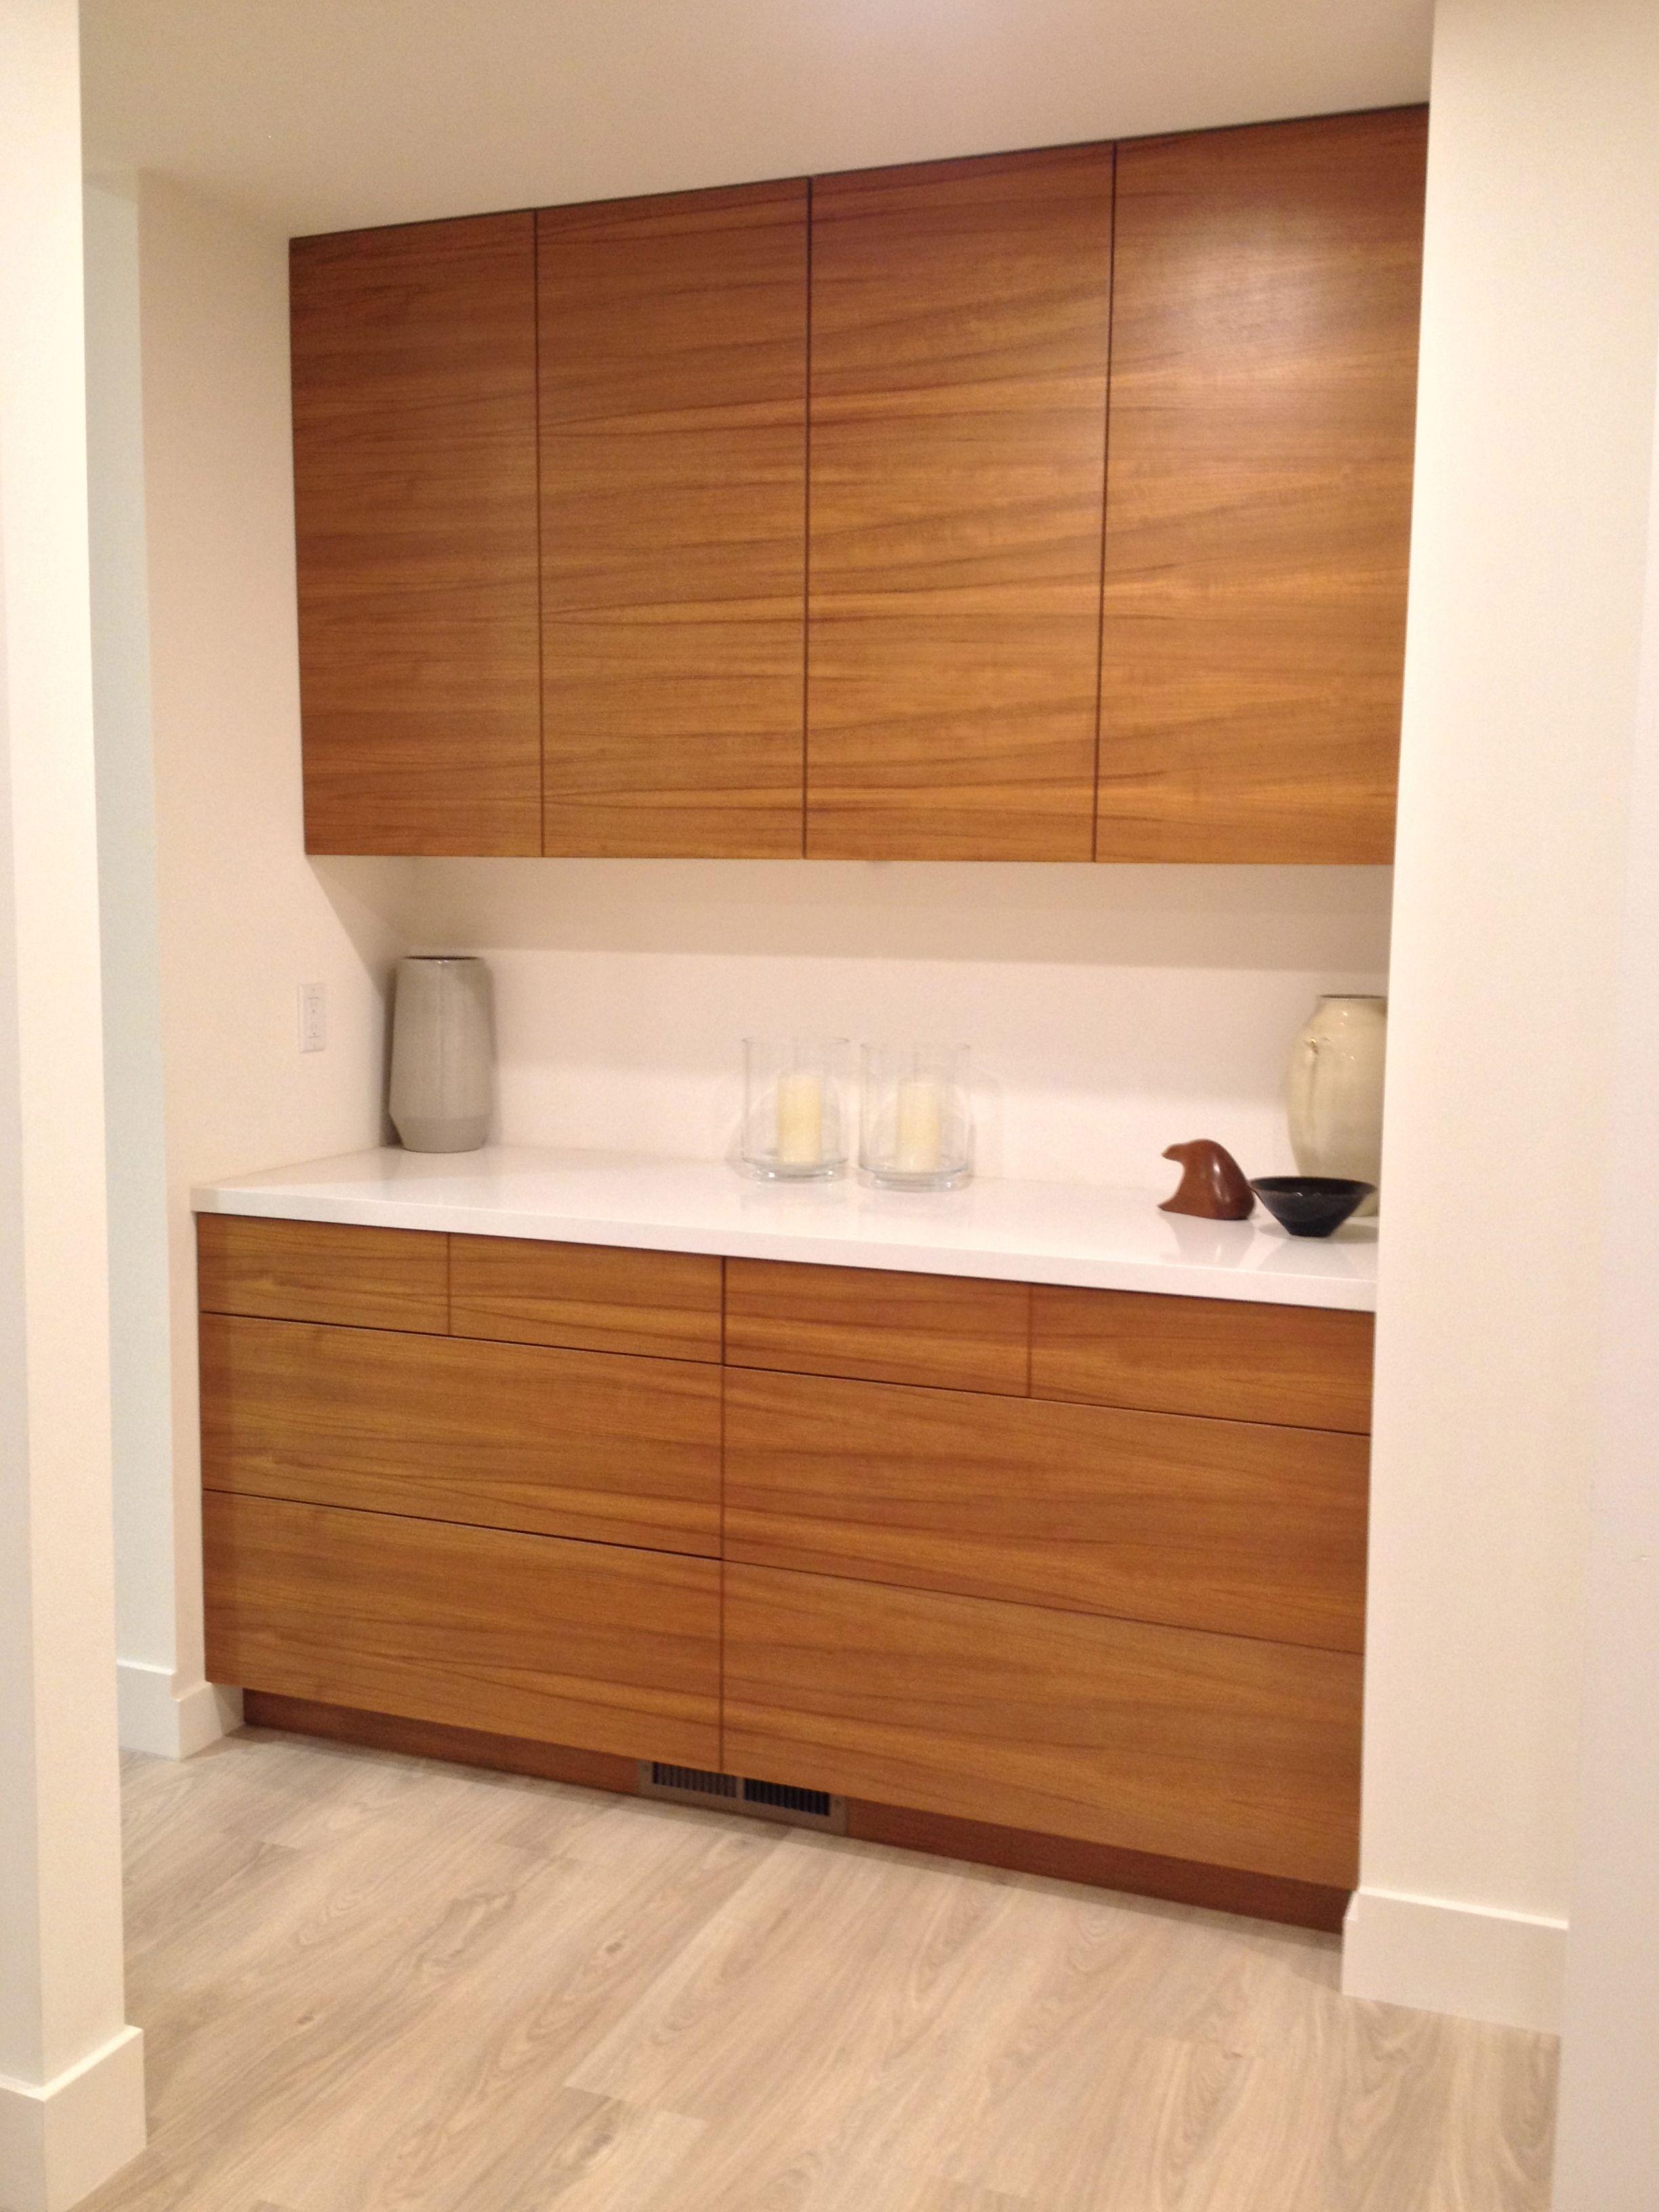 IKEA® kitchen with Semihandmade Flatsawn Teak fronts